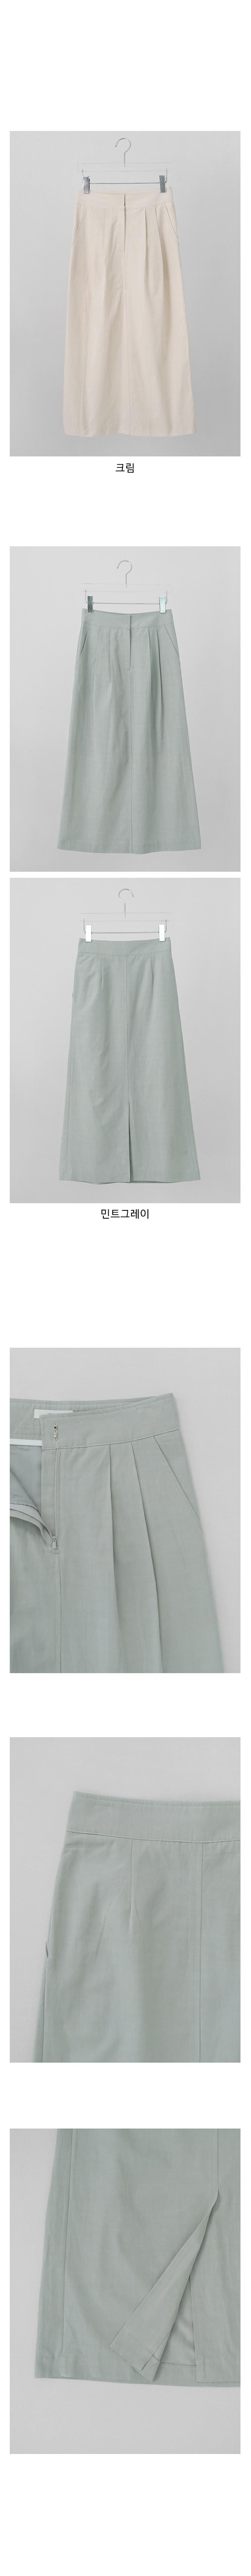 matt straight skirt